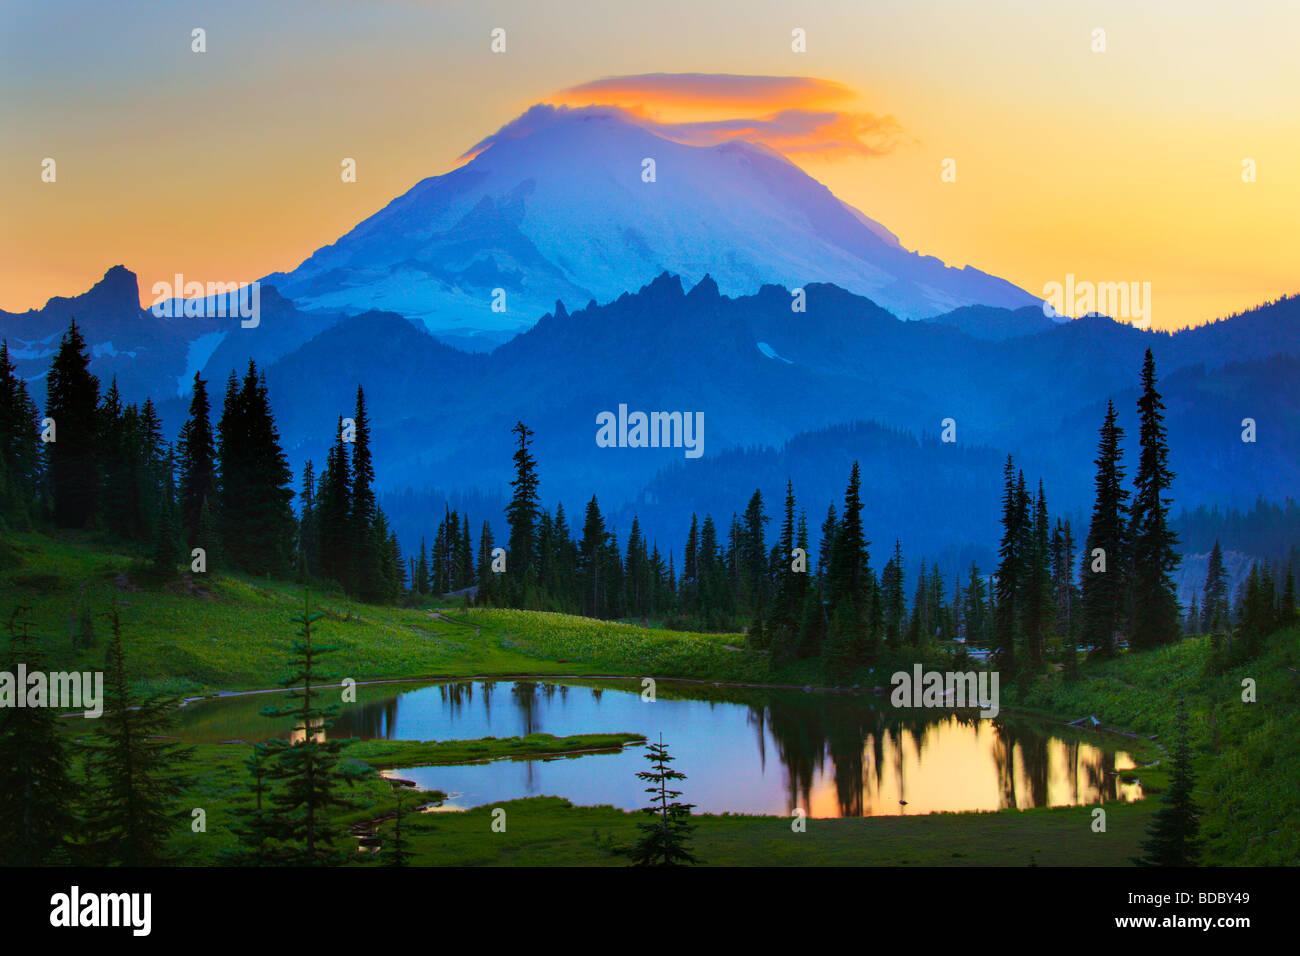 Mount Rainier at sunset from Tipsoo Lake - Stock Image